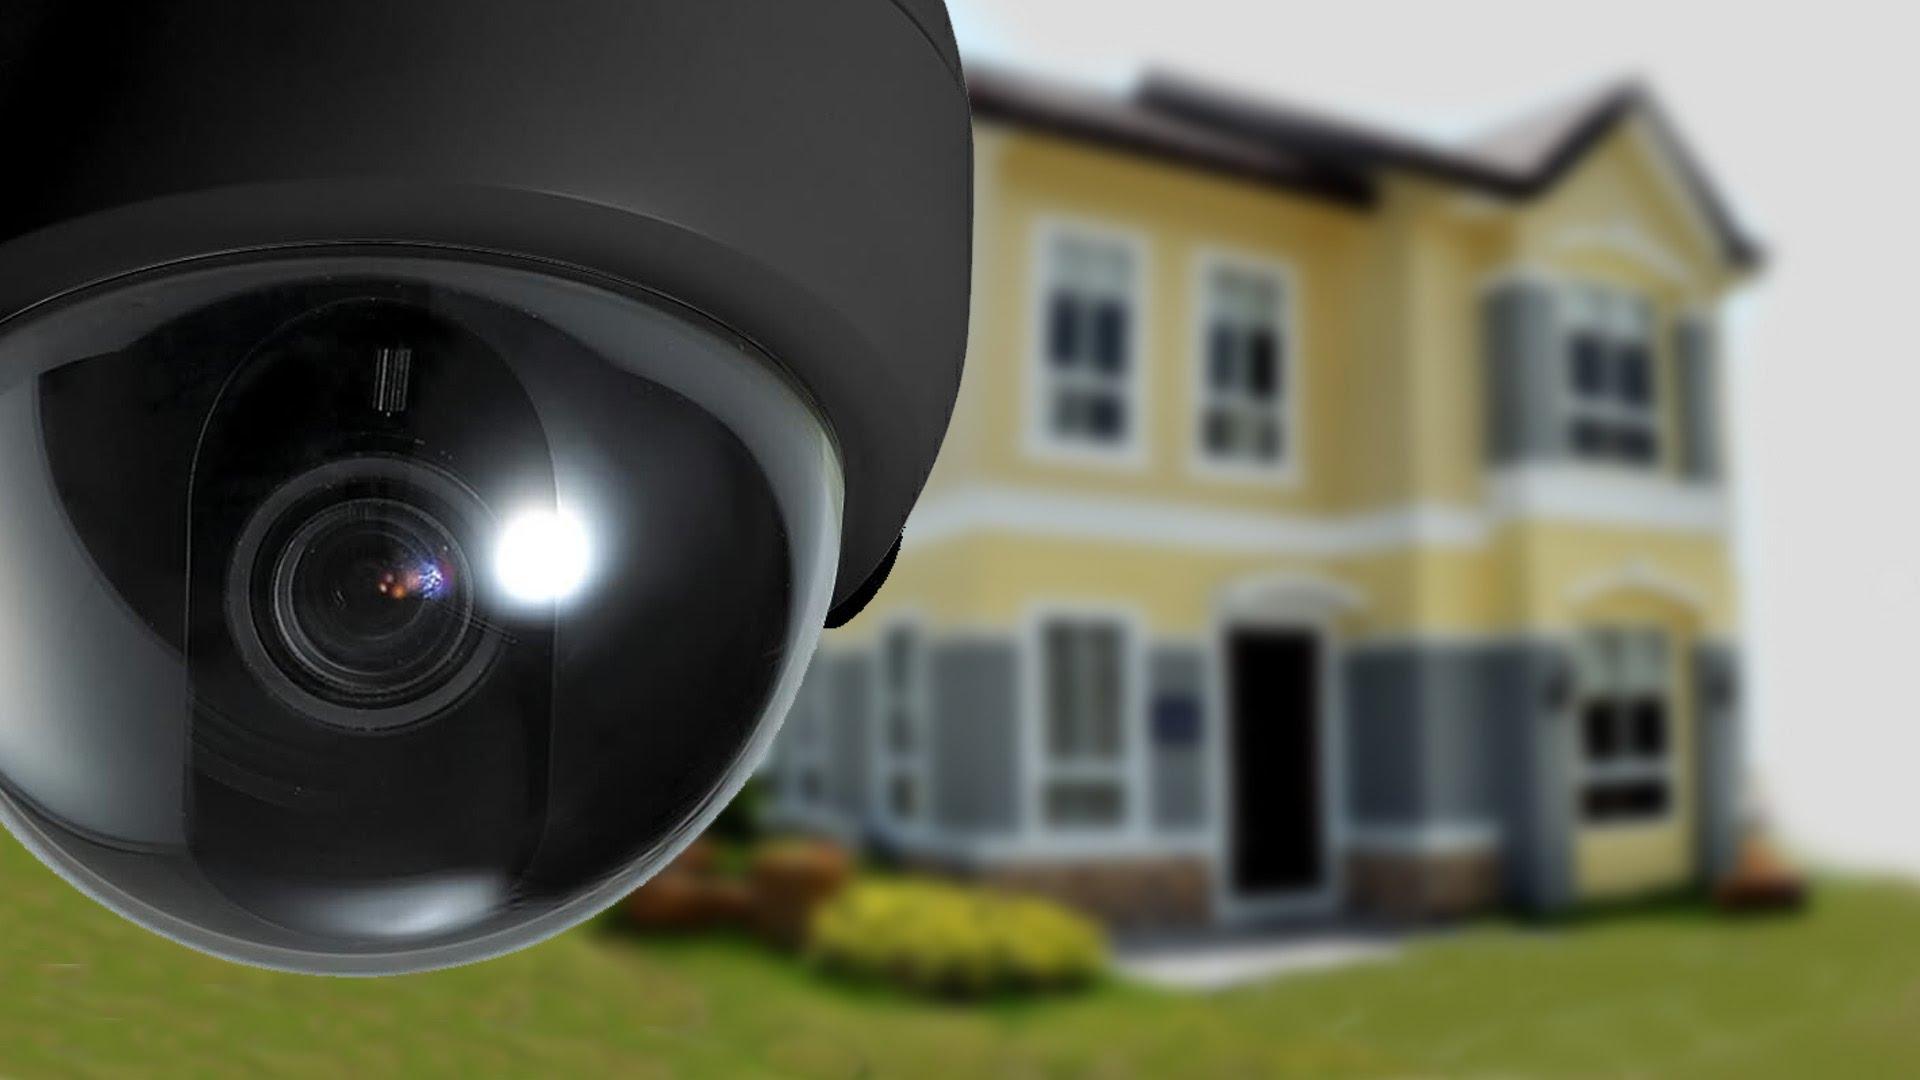 CCTV security camera for home